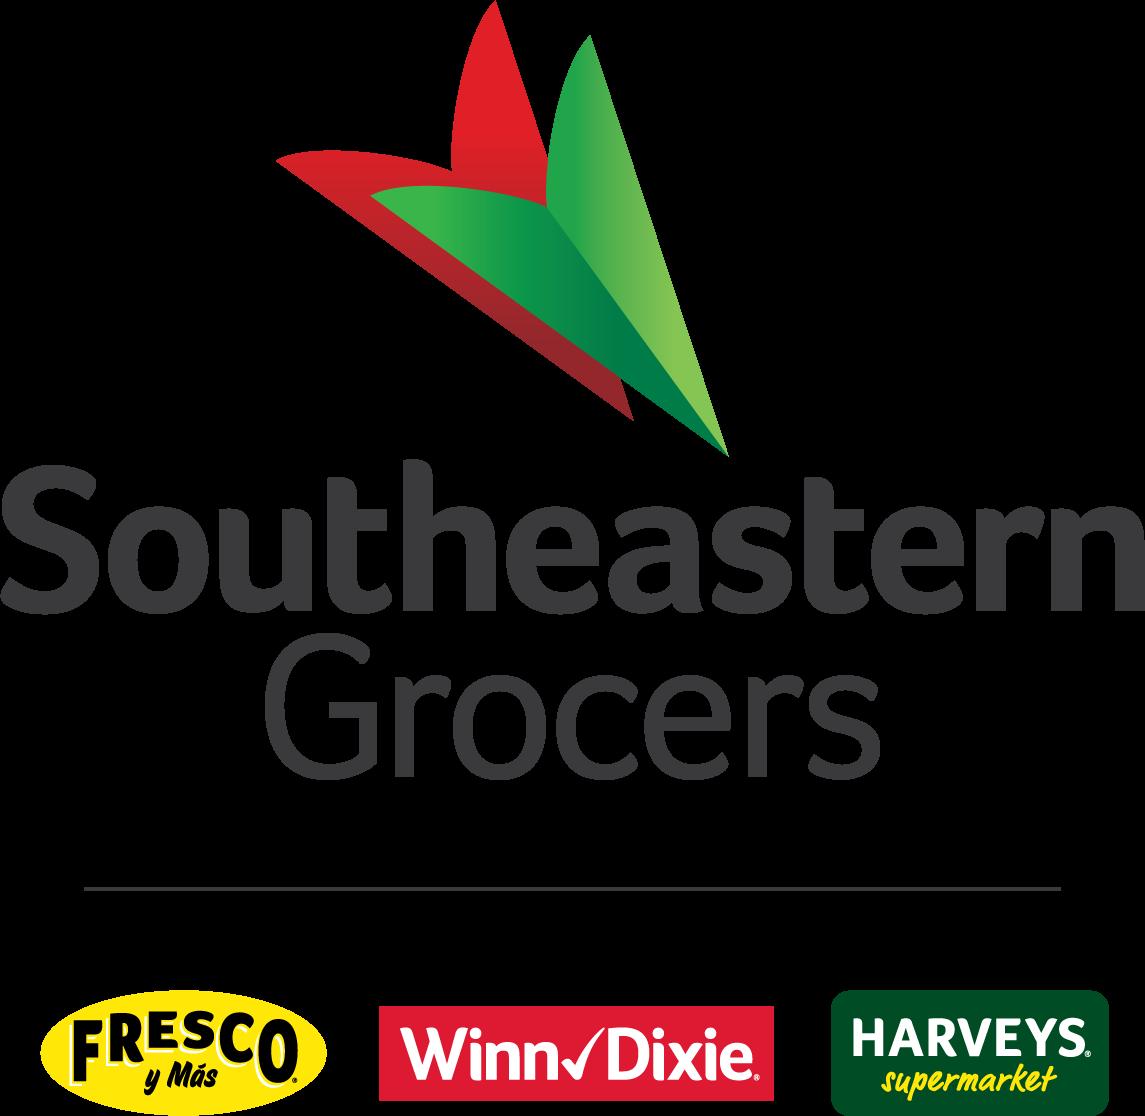 Southeastern Grocers, LLC